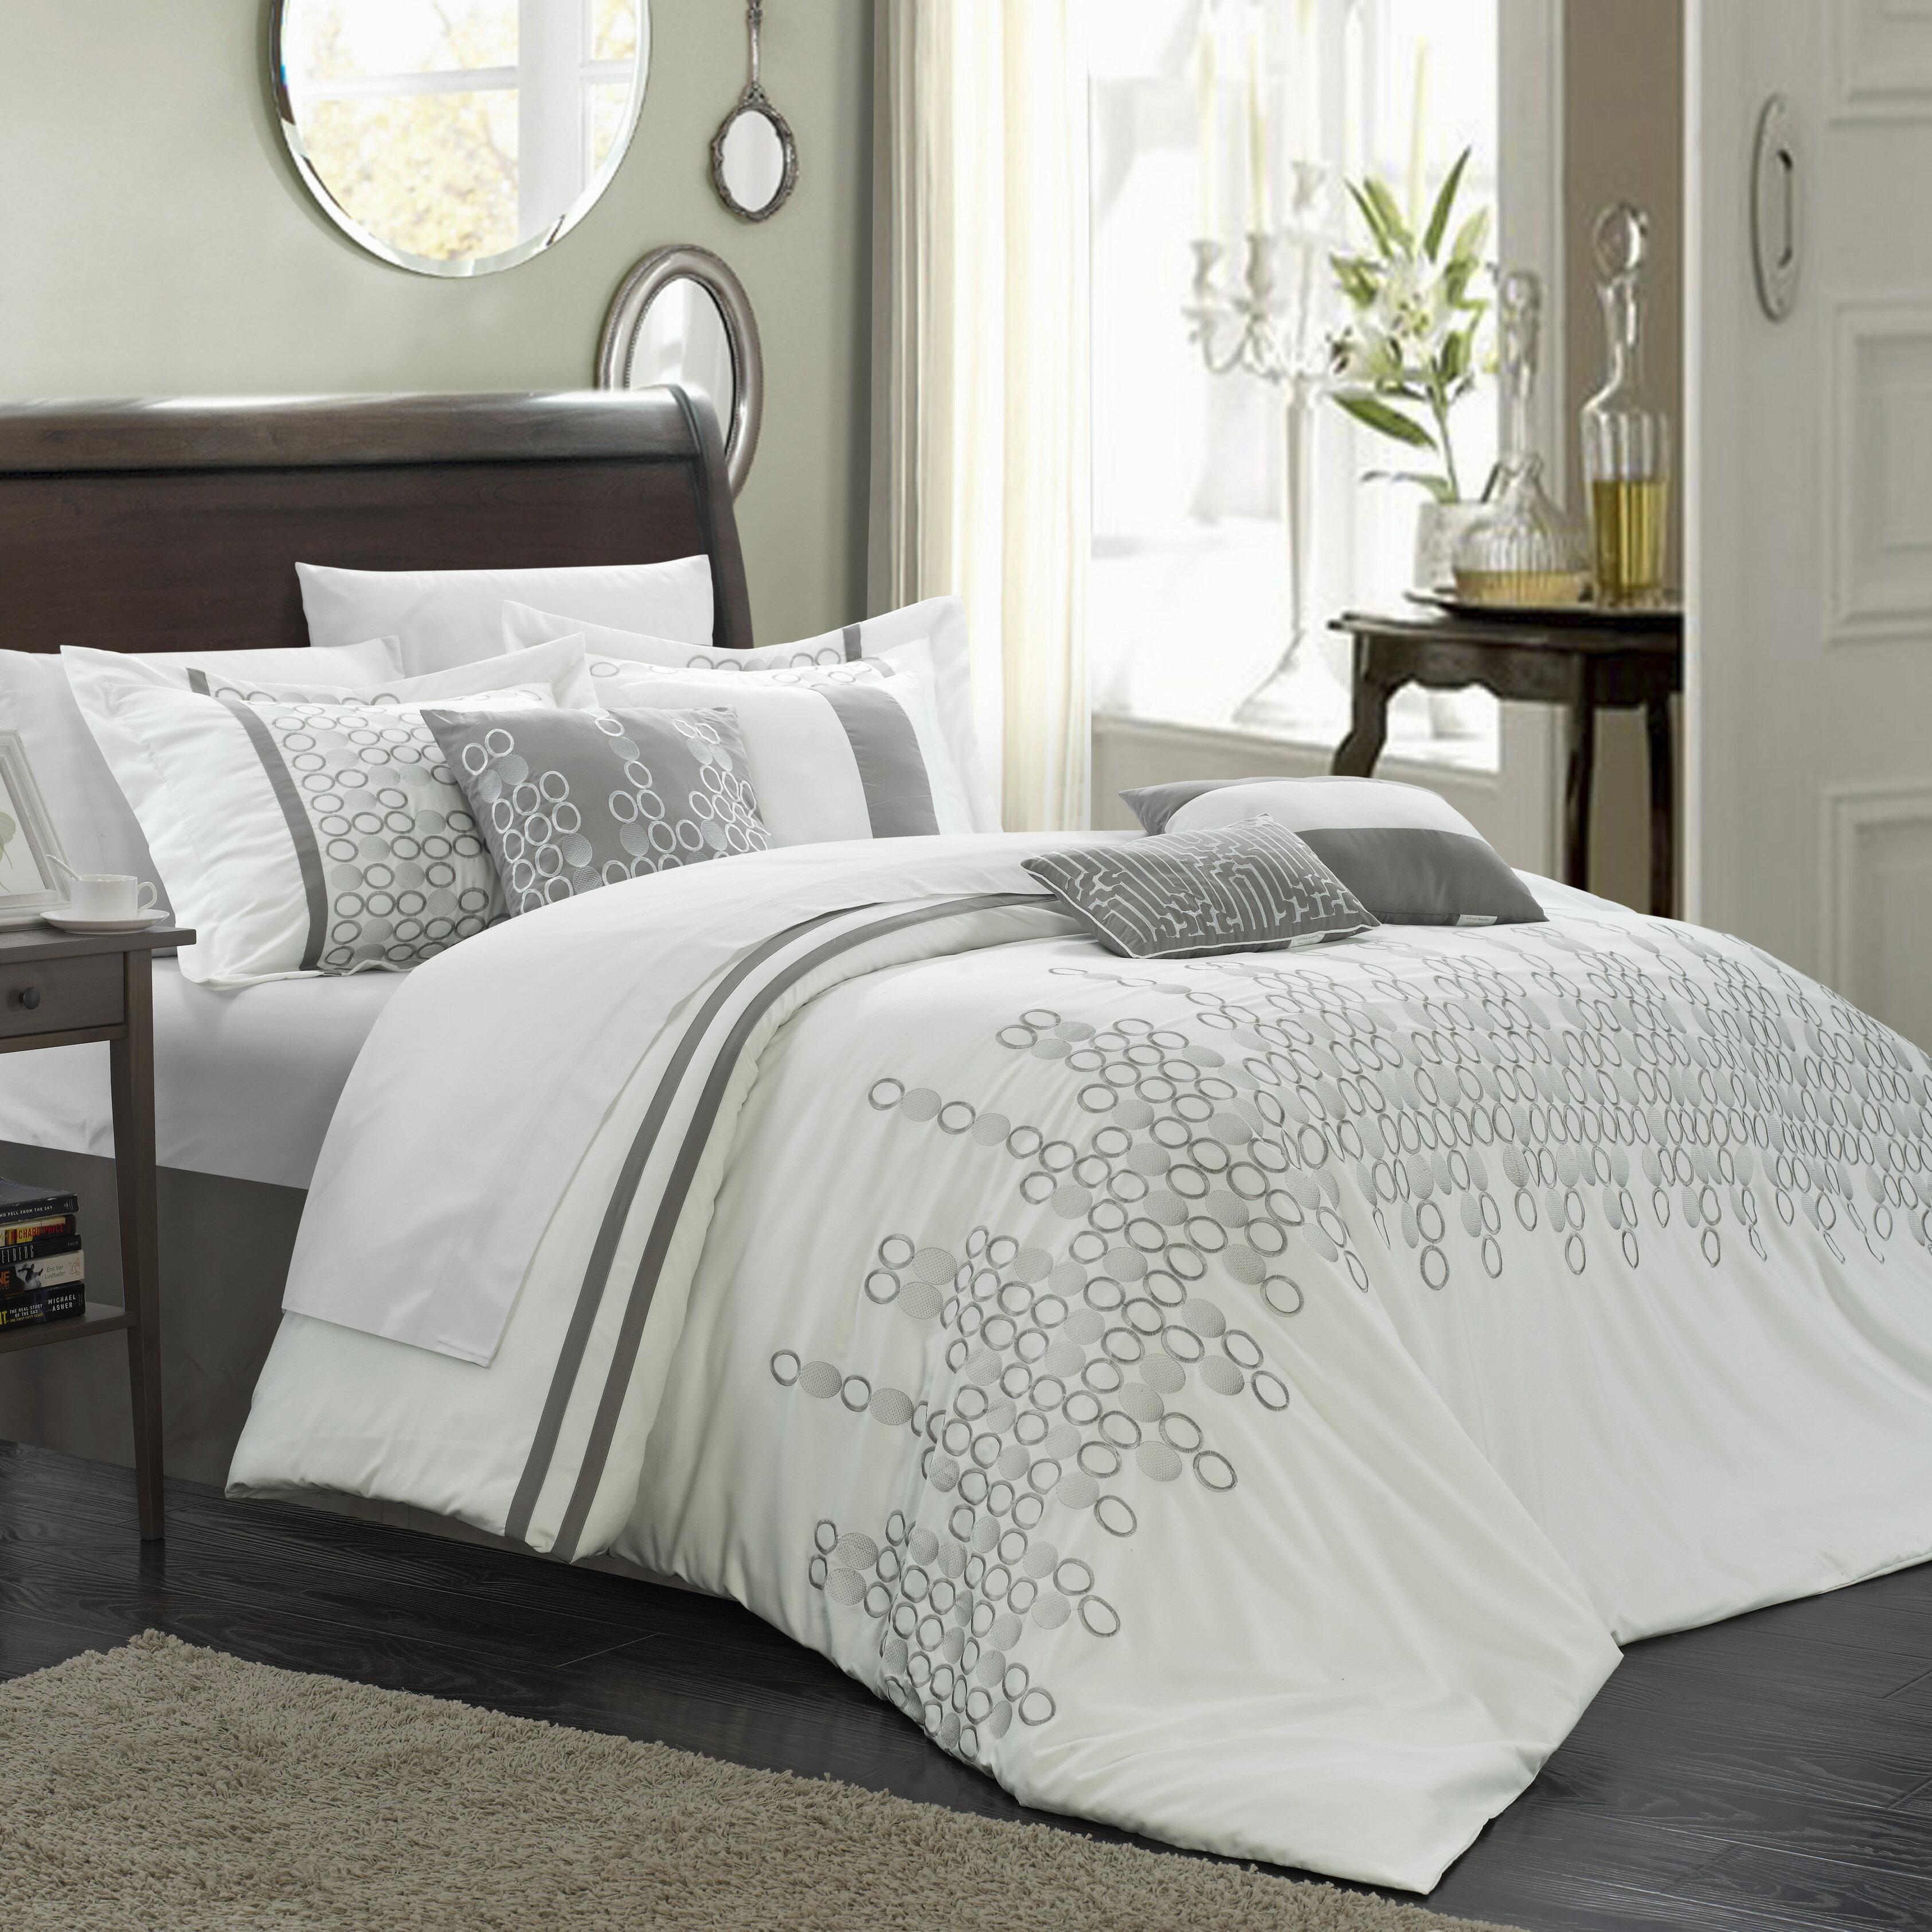 kitchen ralph full lauren duvet sets queen cover sage com comforter floral home amagansett dp amazon layla